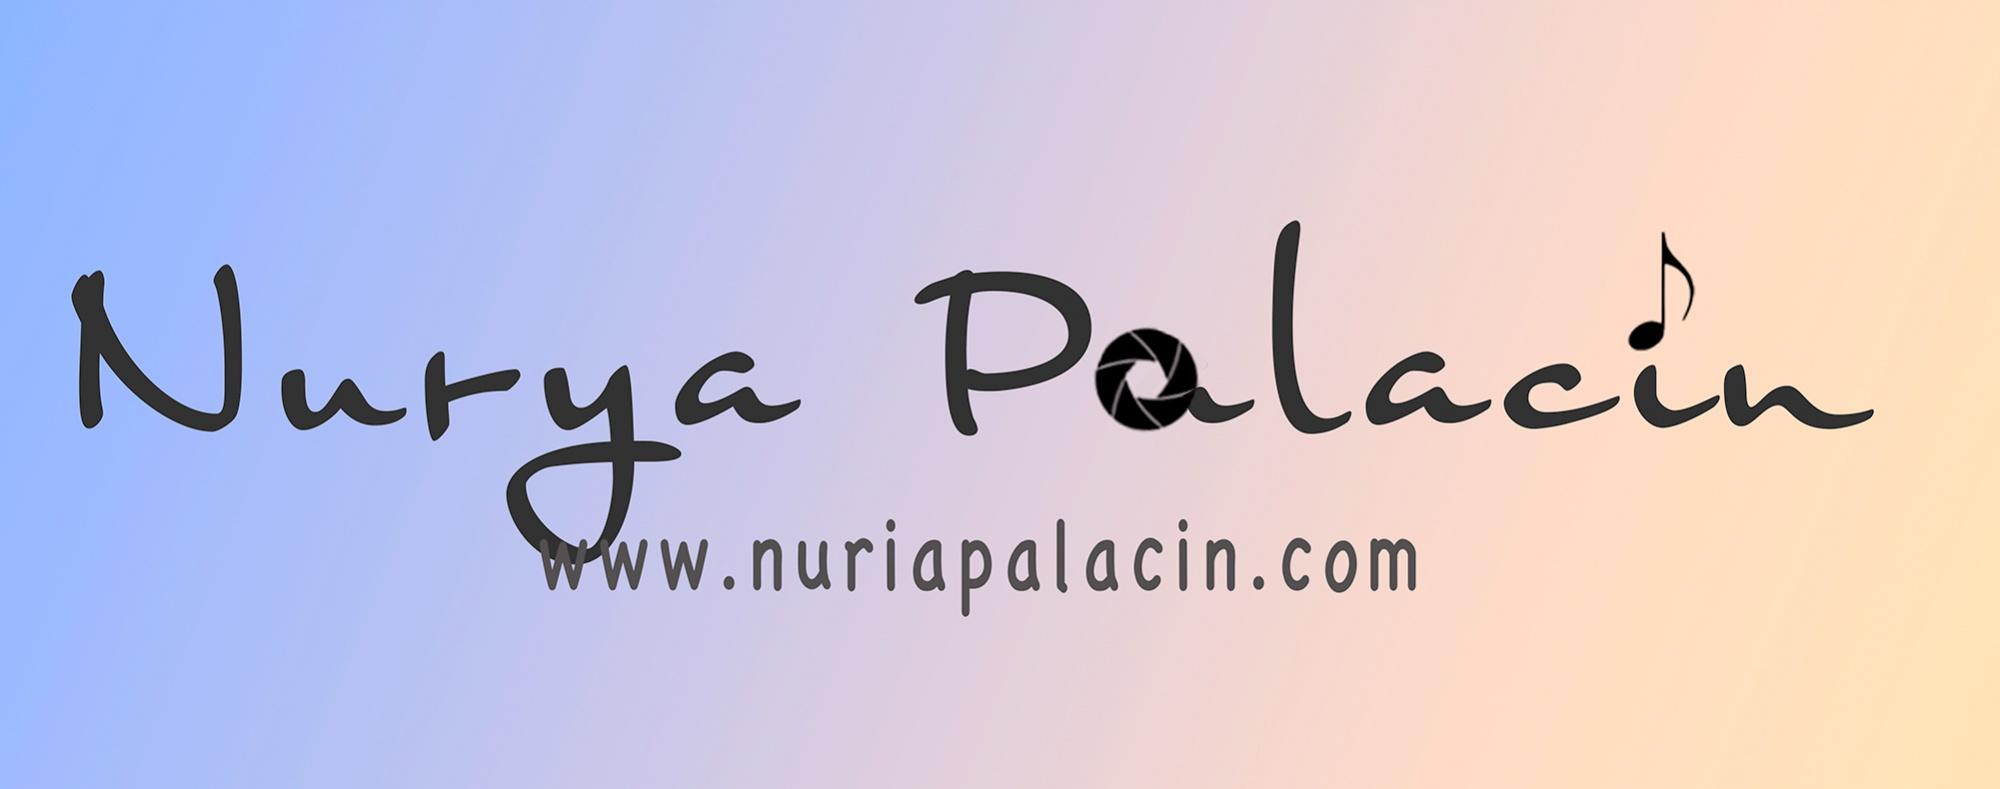 Nurya Palacin - Imagen & Música